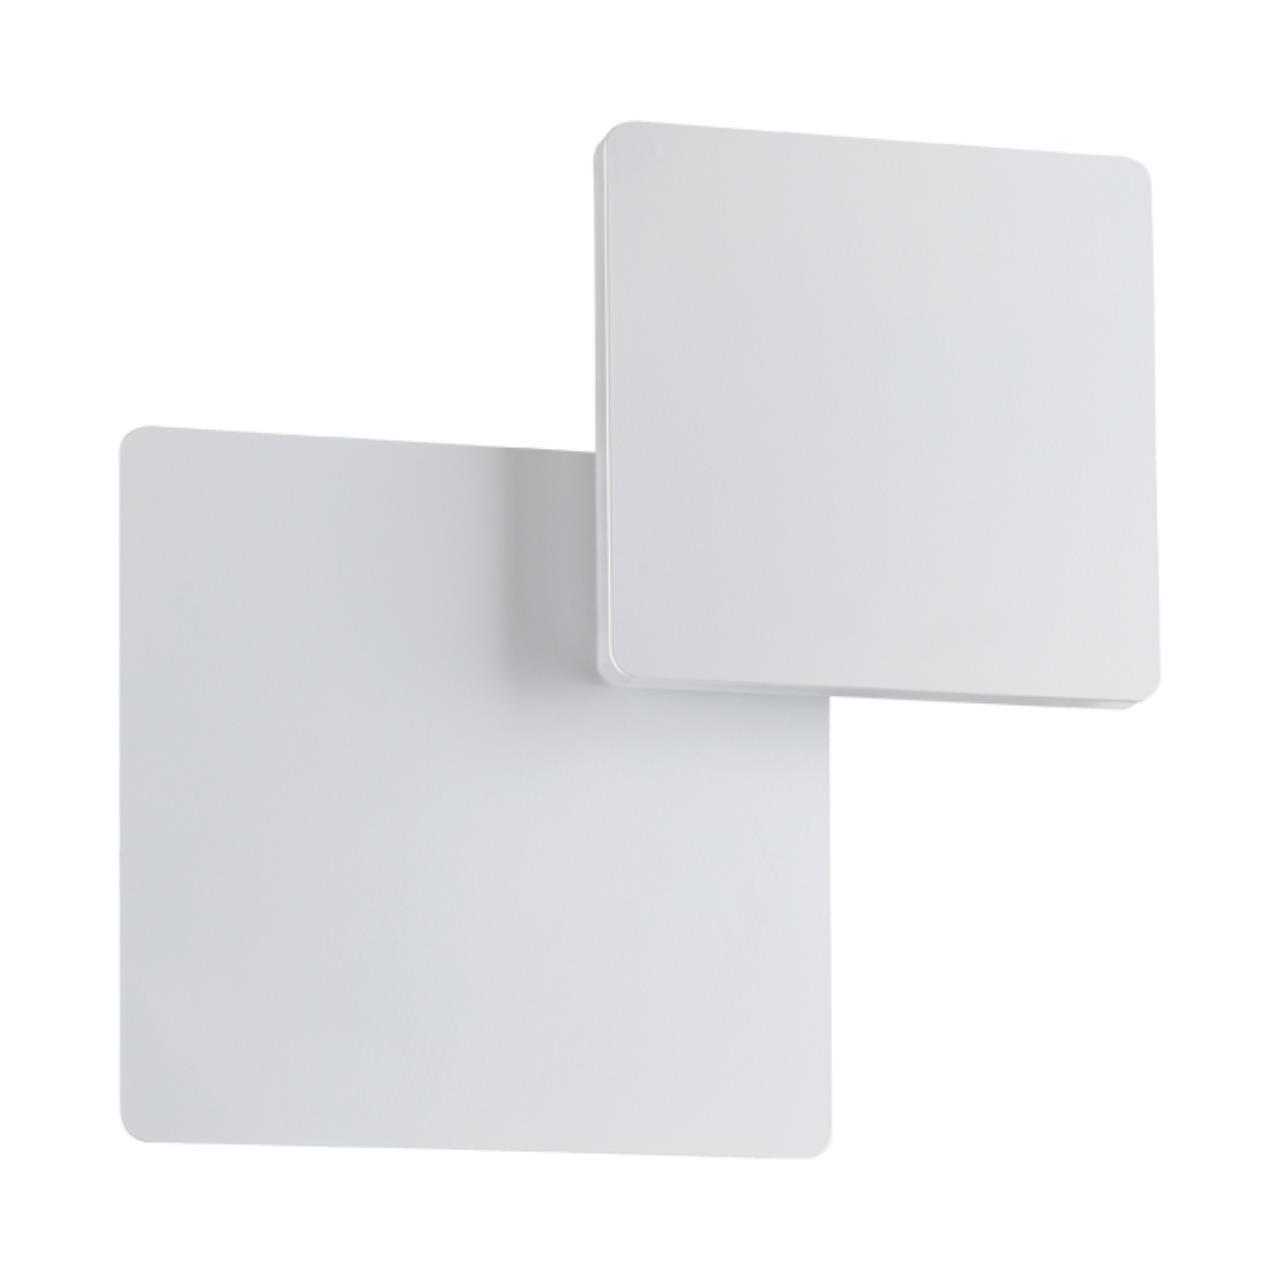 357858 OVER NT18 063 белый Накладной светильник IP20 LED 3000К 6W 110-240V SMENA